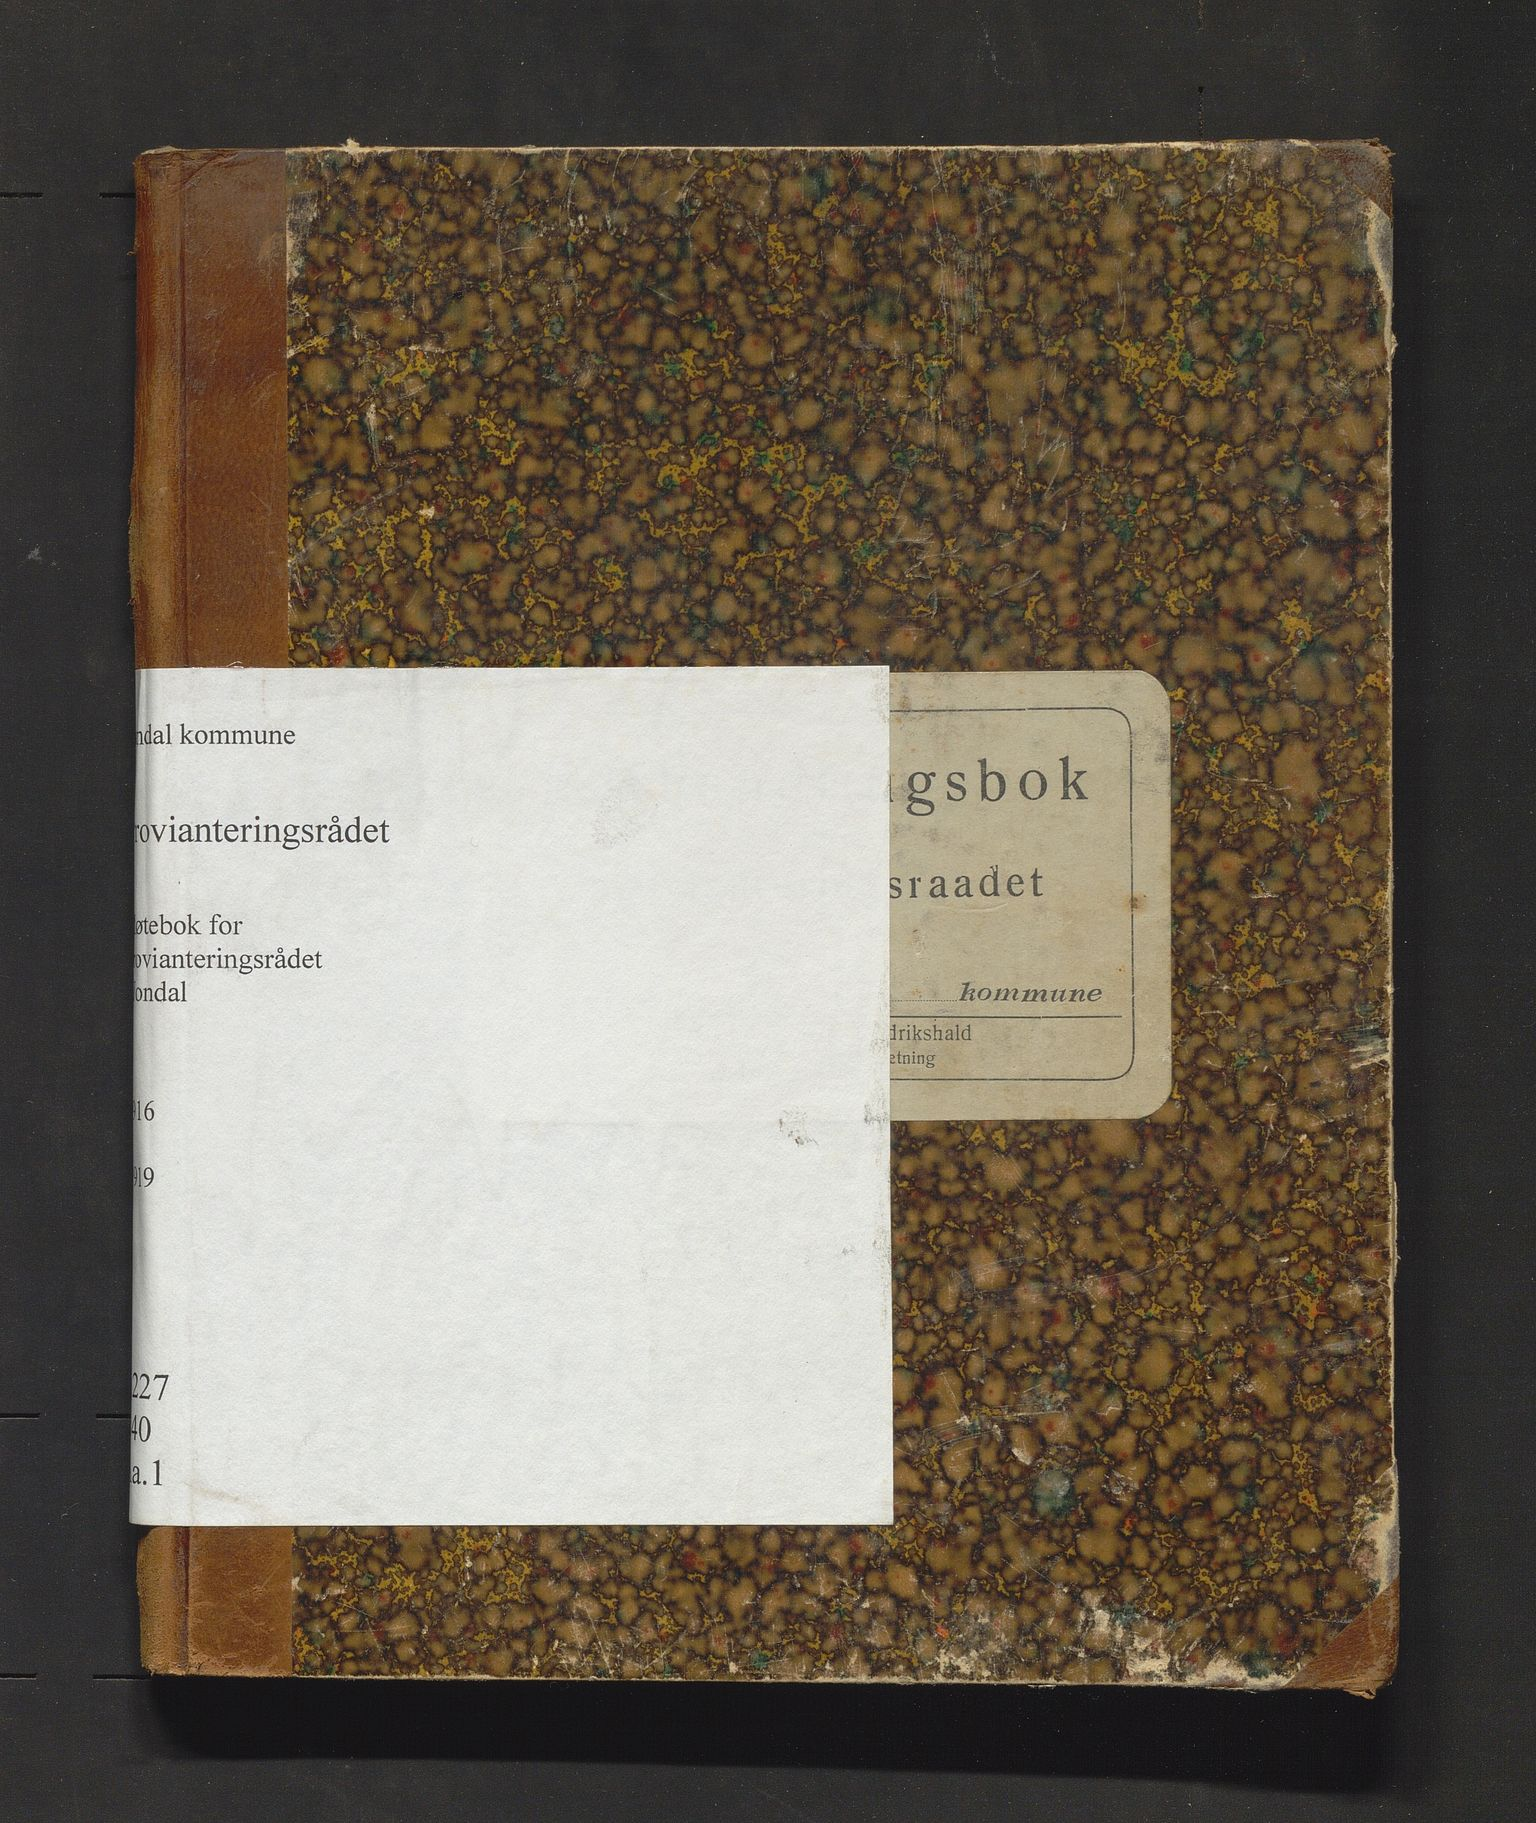 IKAH, Jondal kommune. Provianteringsrådet, A/Aa/L0001: Møtebok for Jondal provianteringsråd, 1916-1919